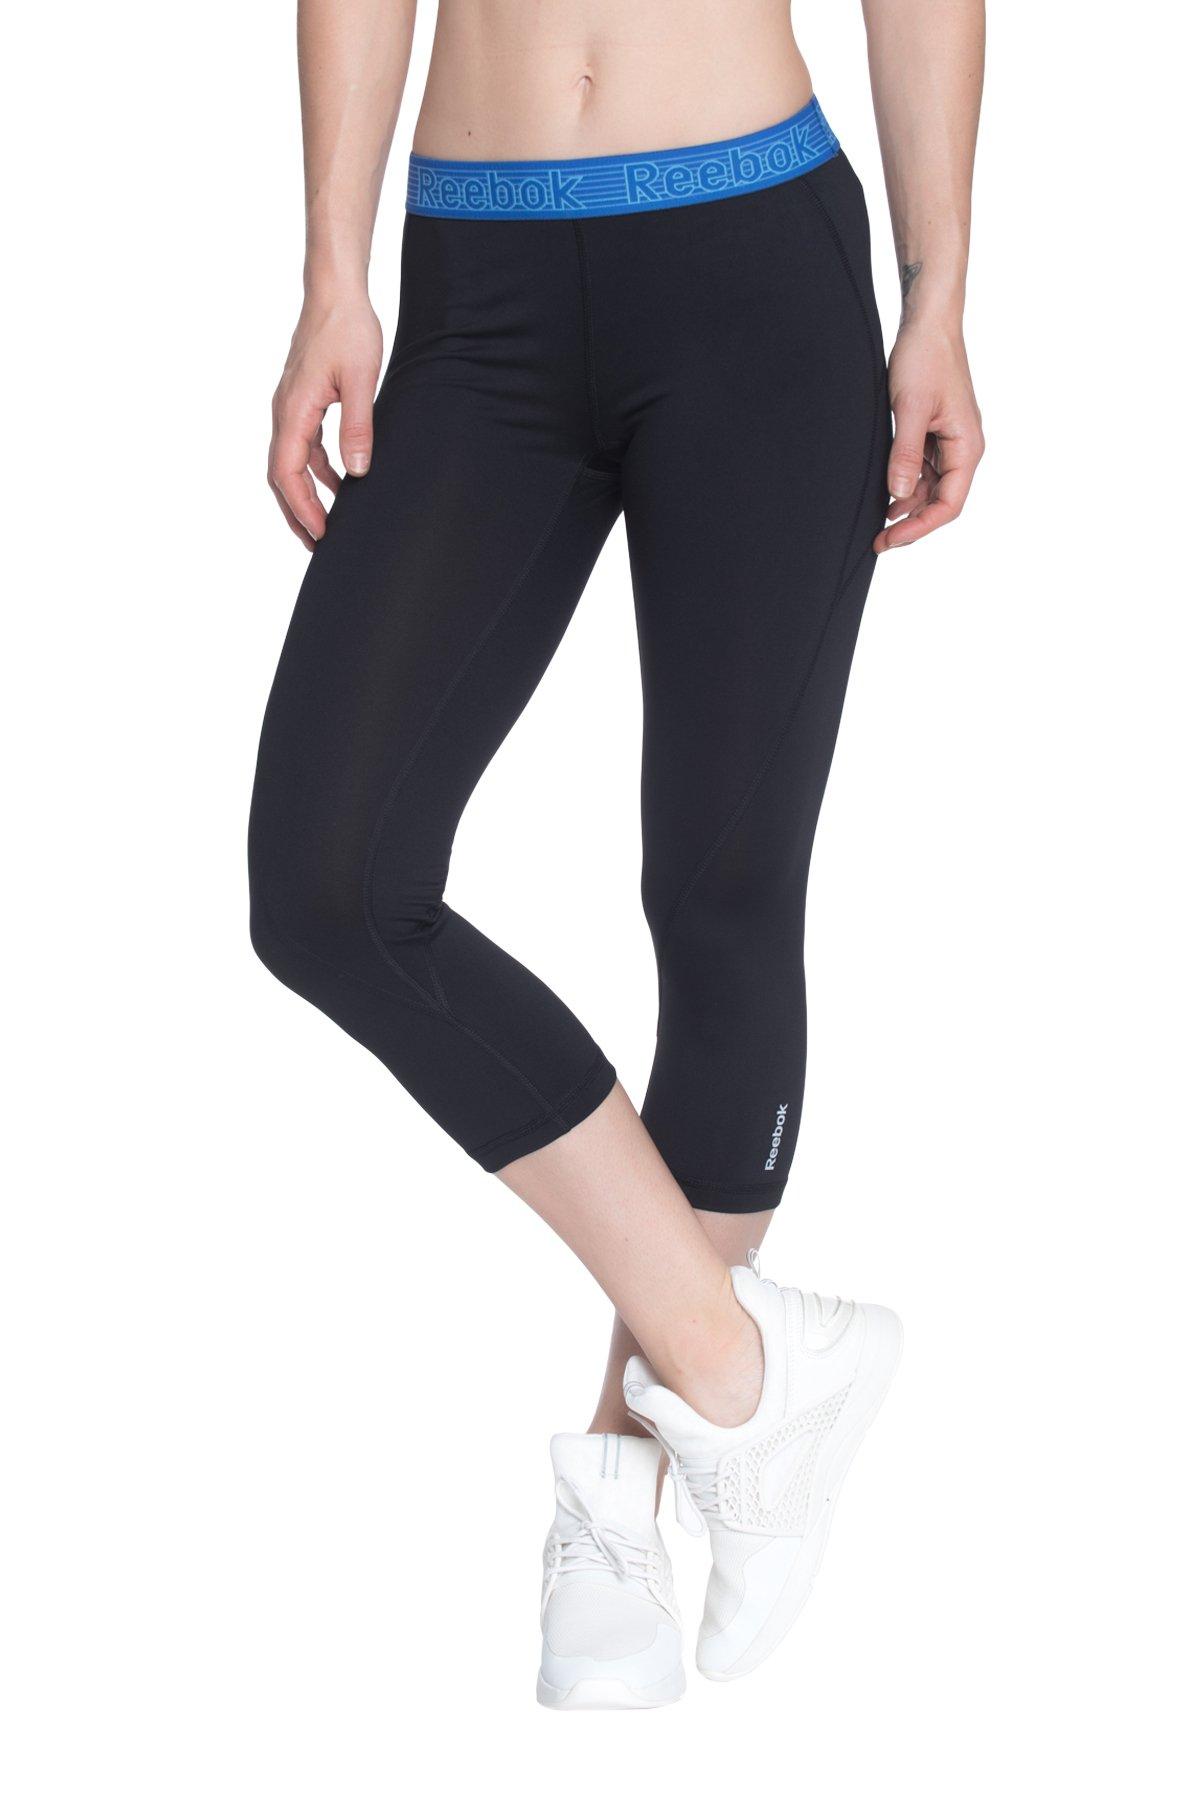 7d181d342de88 Galleon - Reebok Women's Printed Capri Leggings With Mid-Rise Waist  Performance Compression Tights, Black/Dazzling Blue, X-Small